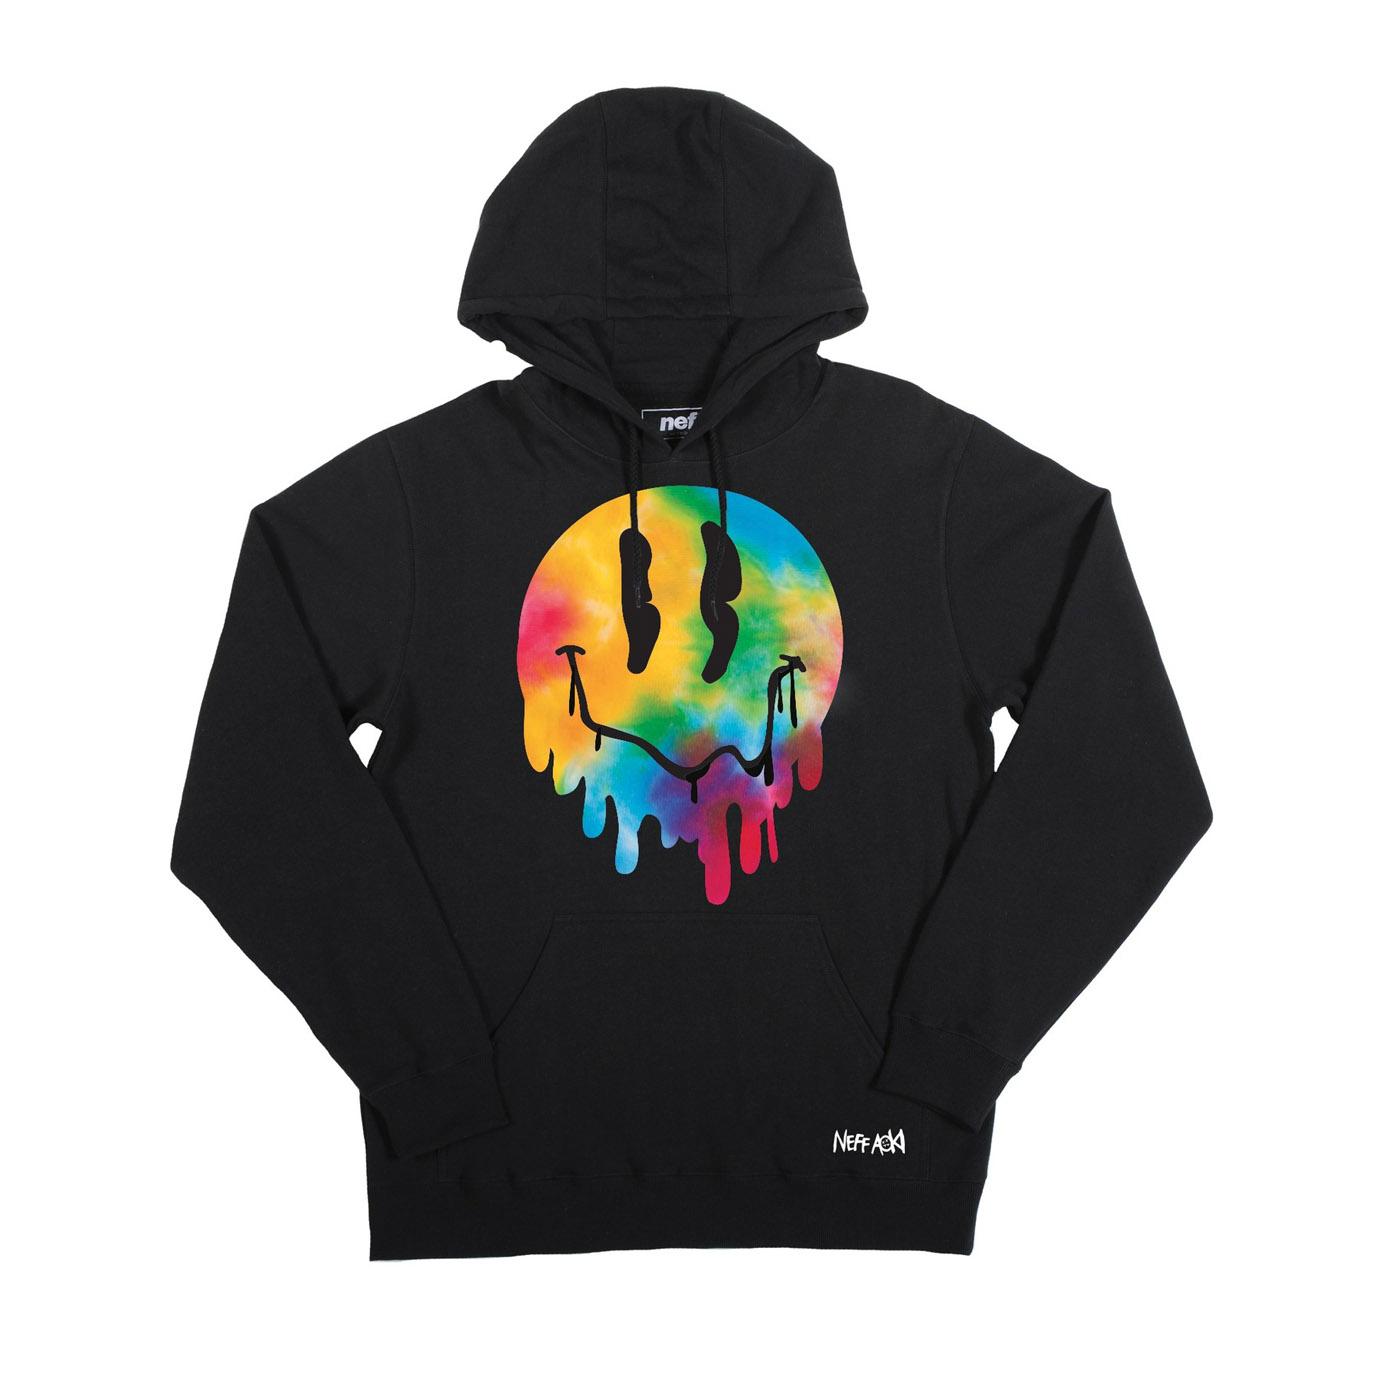 neff-Aoki-hoodie